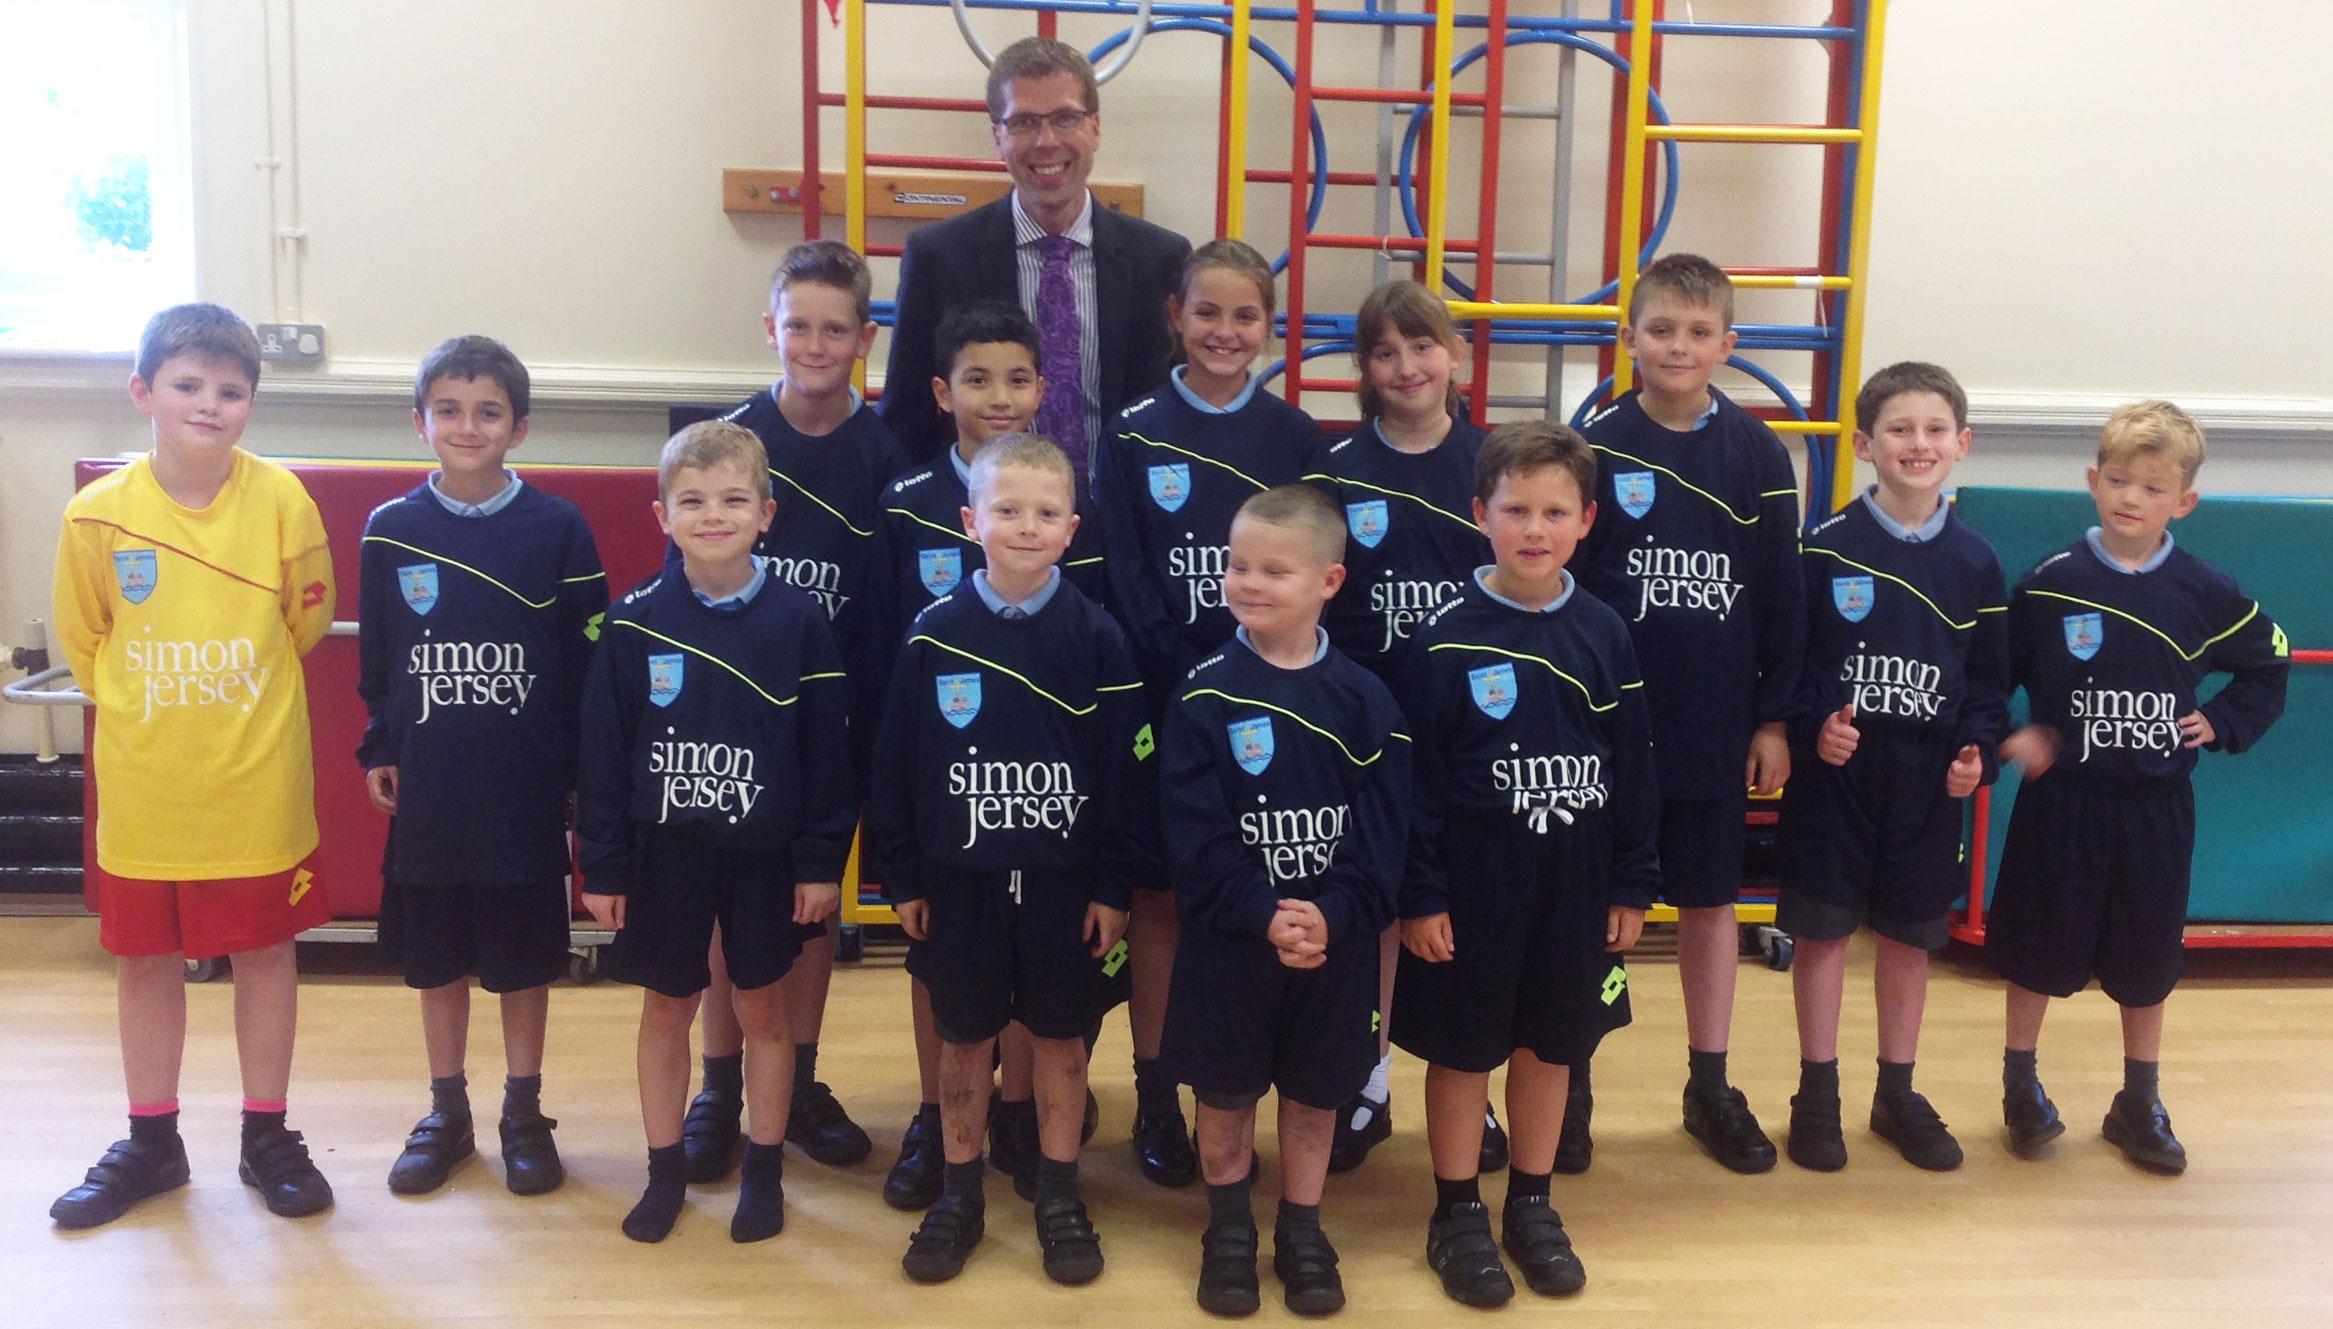 SchoolFootballTeam-Header